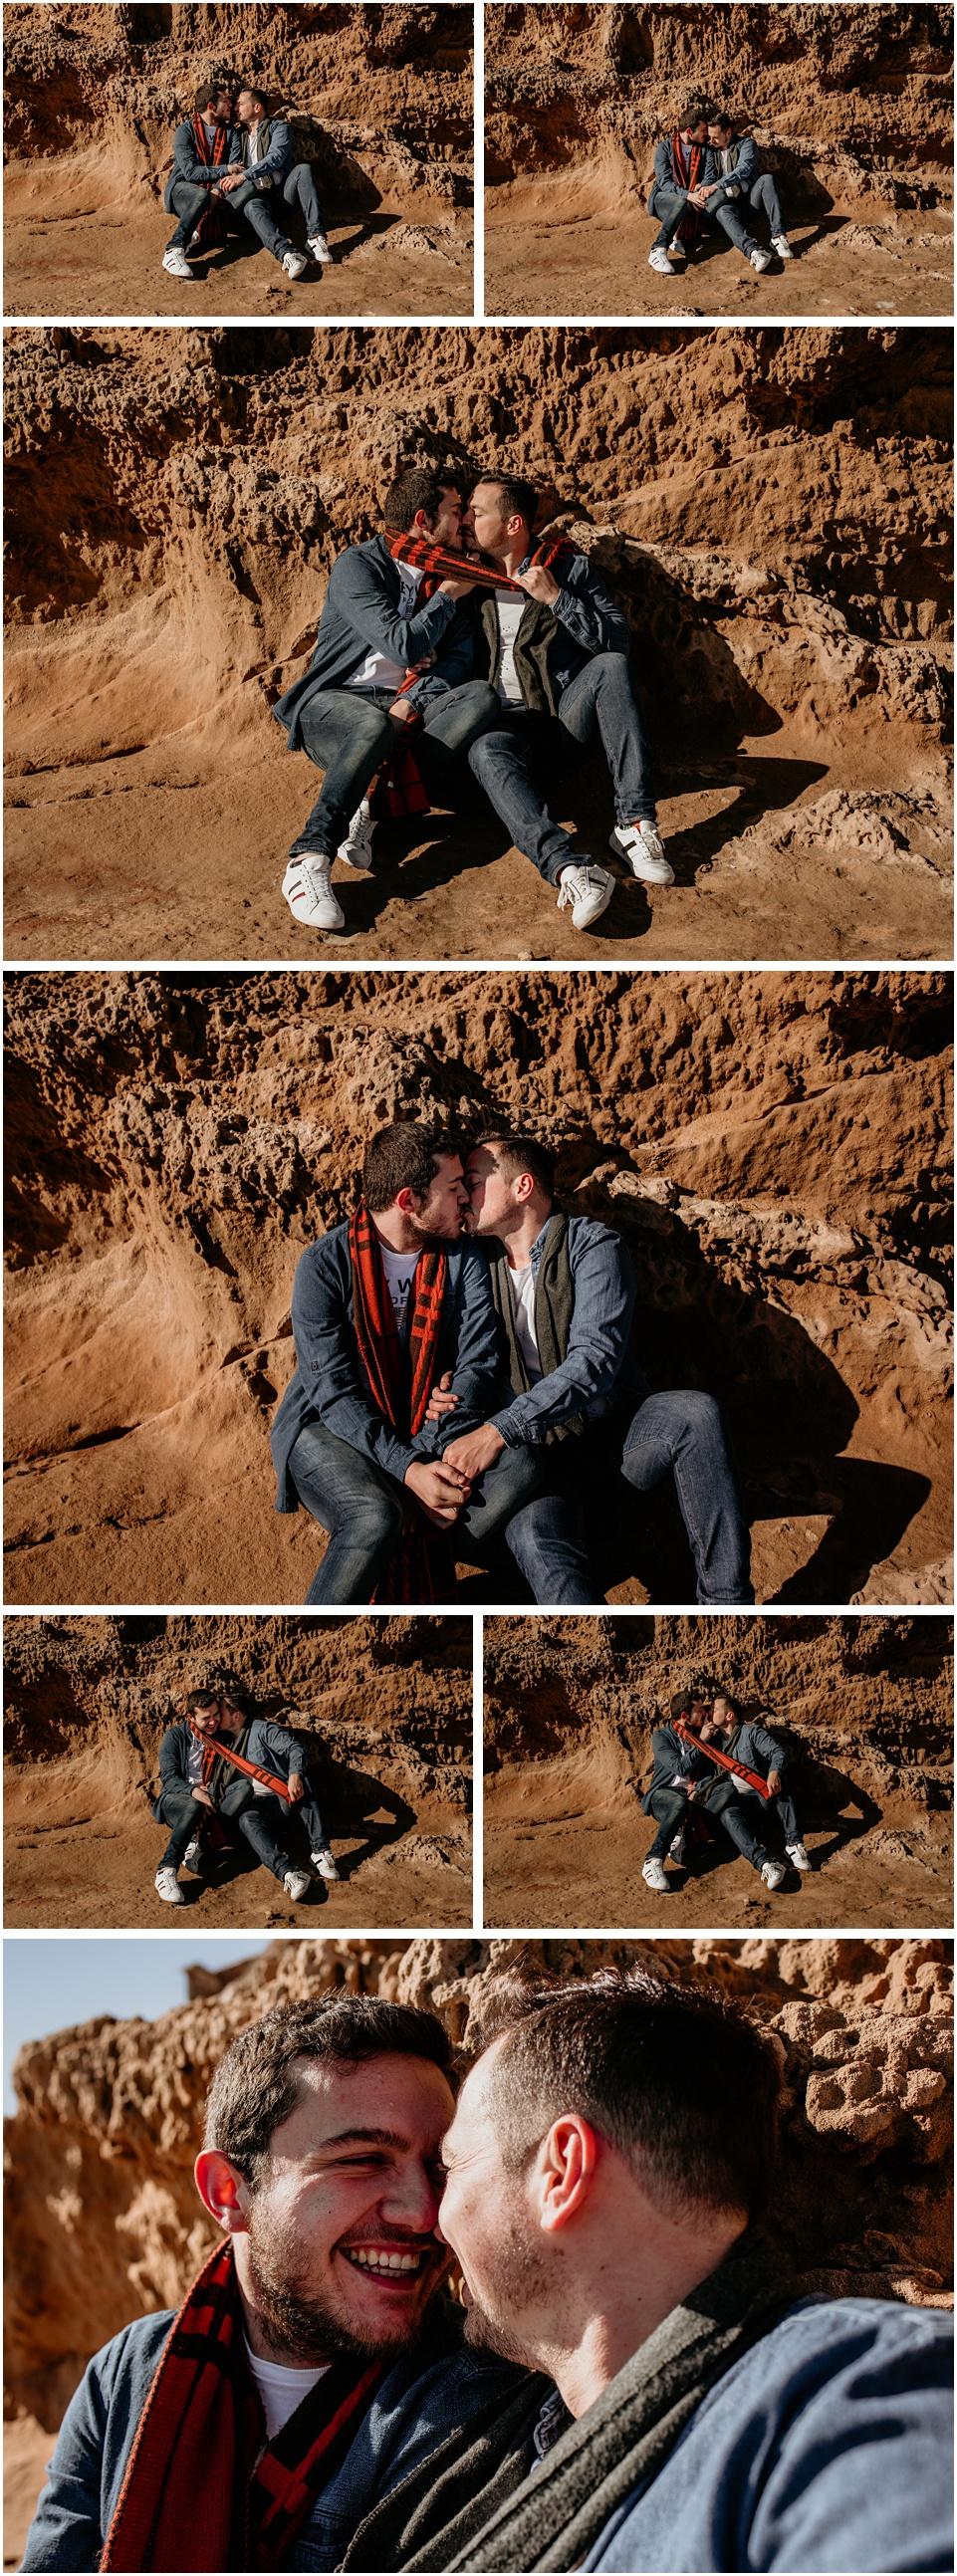 Fotos en pareja,fotografo de parejas,fotografo de parejas gays,gay,hombres,love is love,love is love sesion de pareja,pareja de hombres,pareja gay,sesion de pareja,